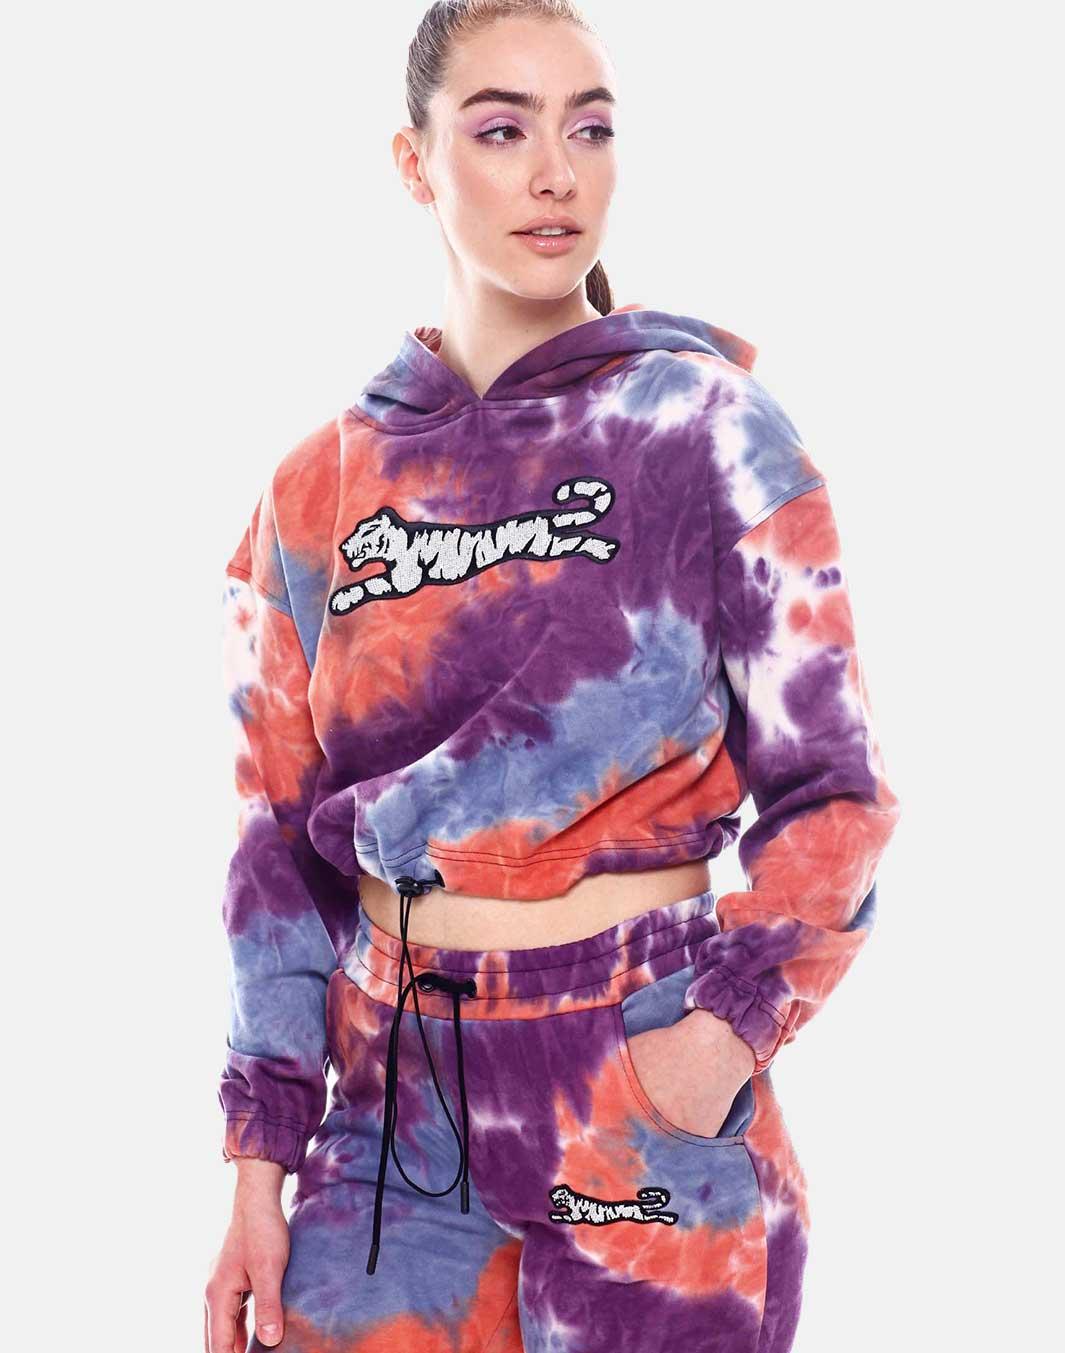 New Tie Dye for Women at DrJays.com